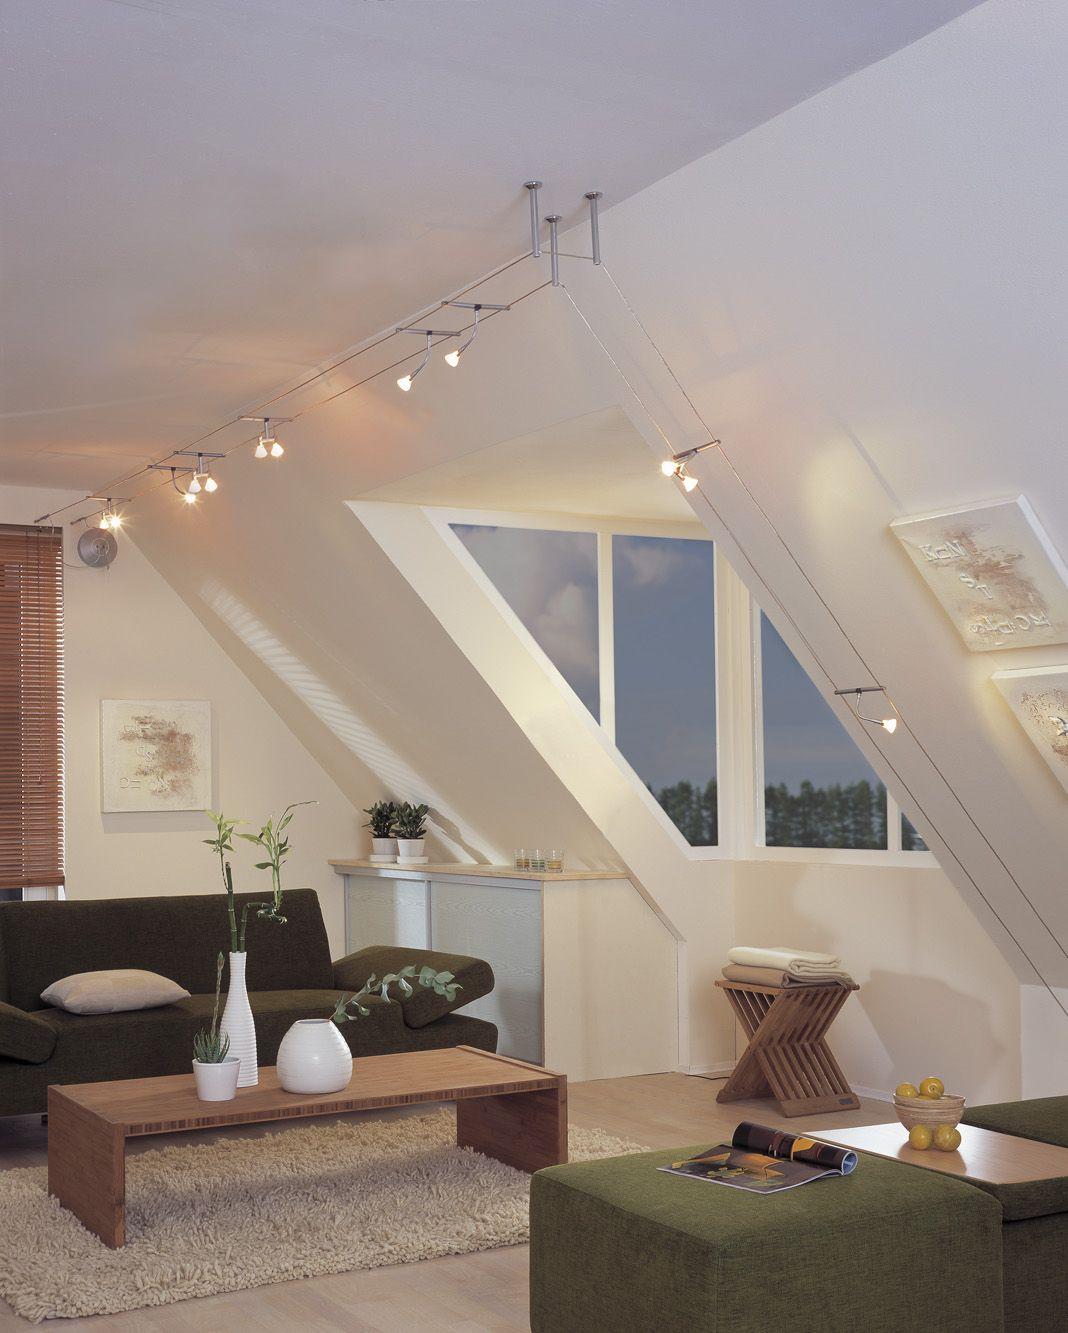 seilsystem awesomeness pinterest seilsysteme. Black Bedroom Furniture Sets. Home Design Ideas